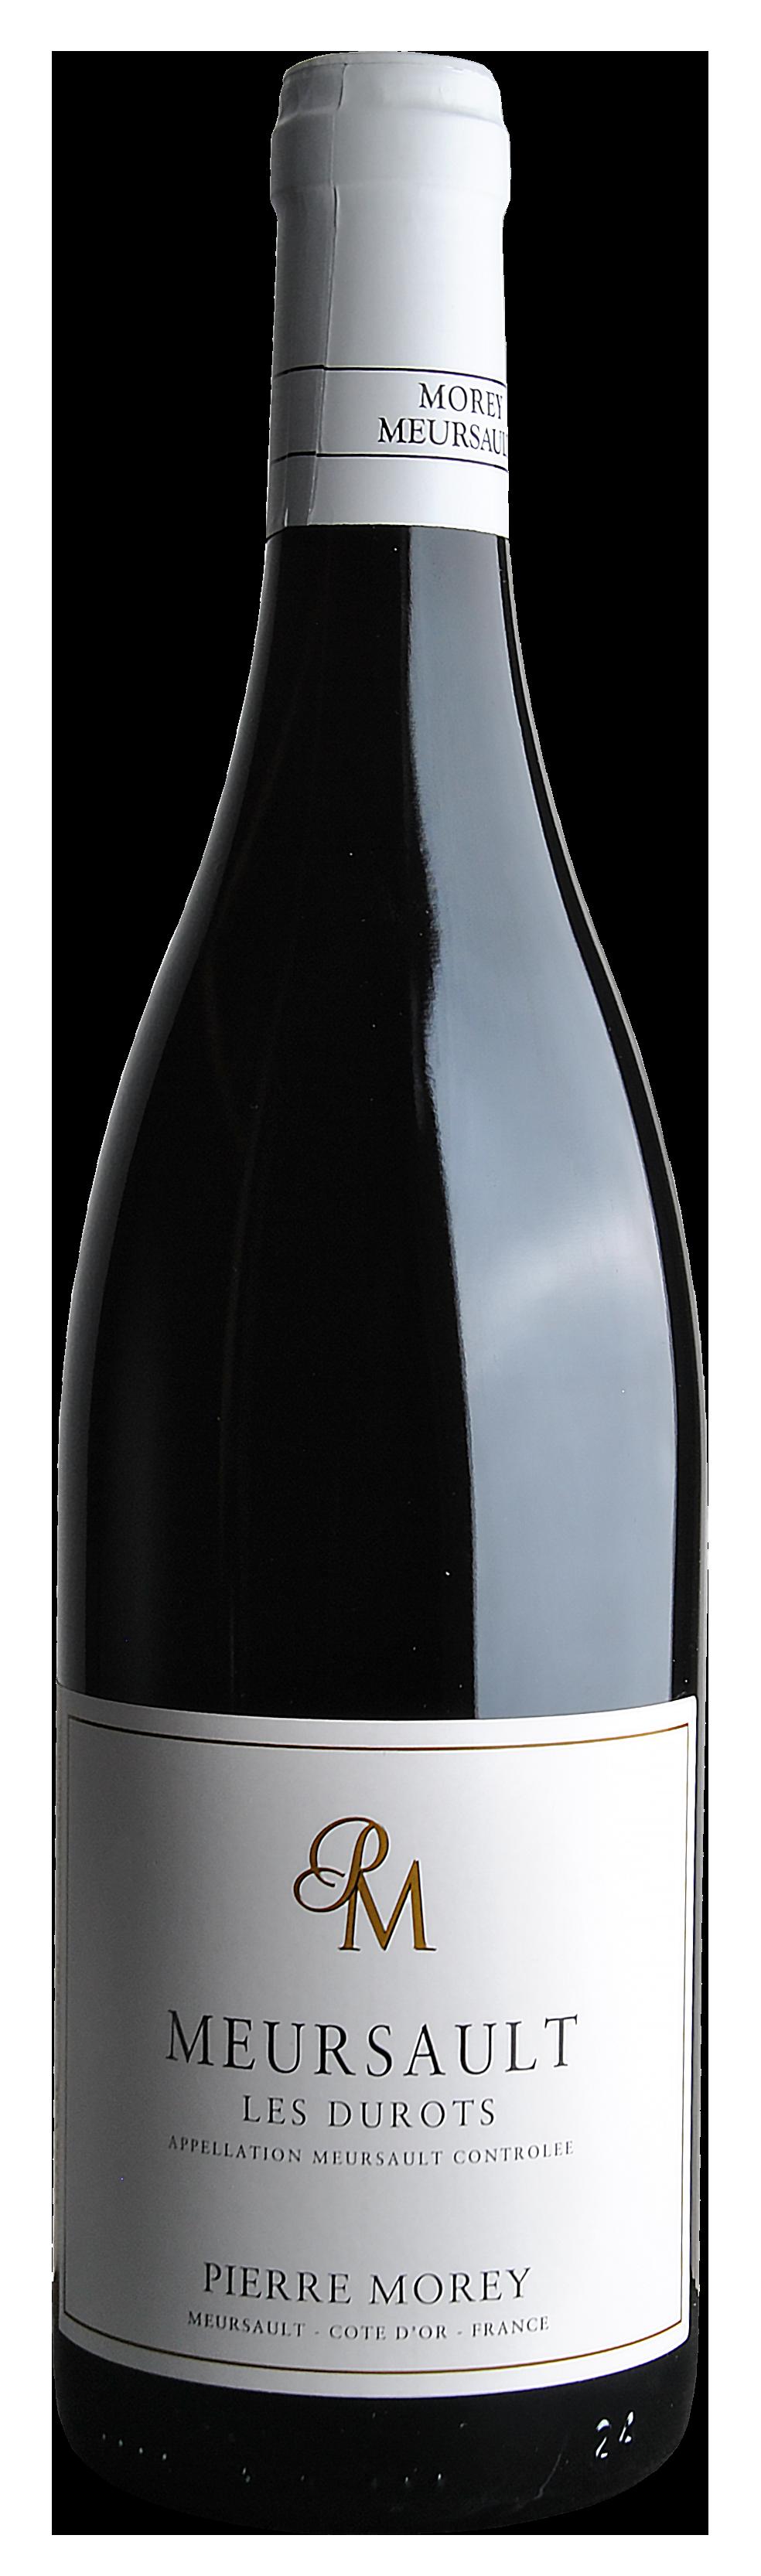 Meursault - Vins Pirard